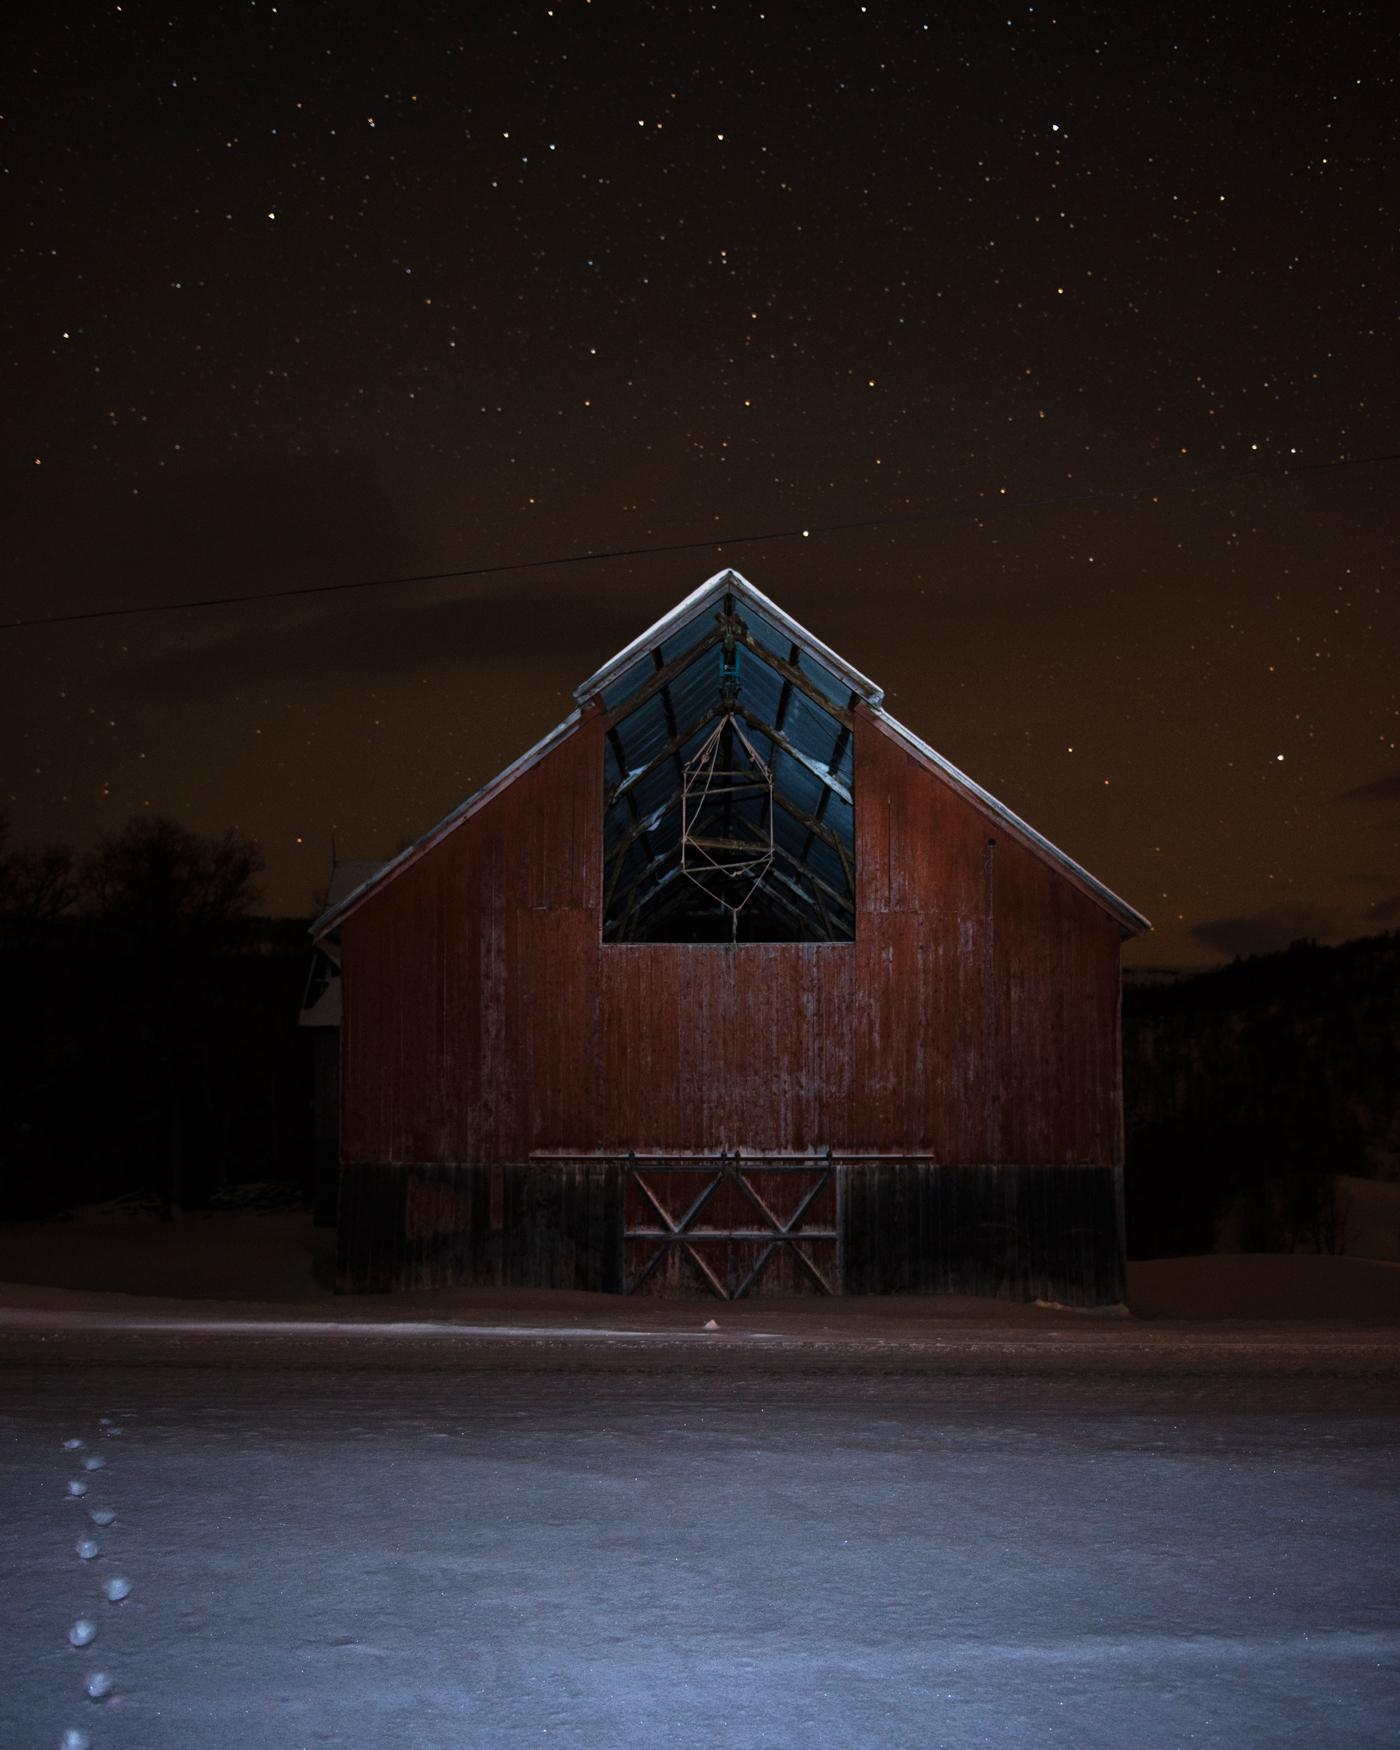 Abandoned barn in Hessdalen. February 2013